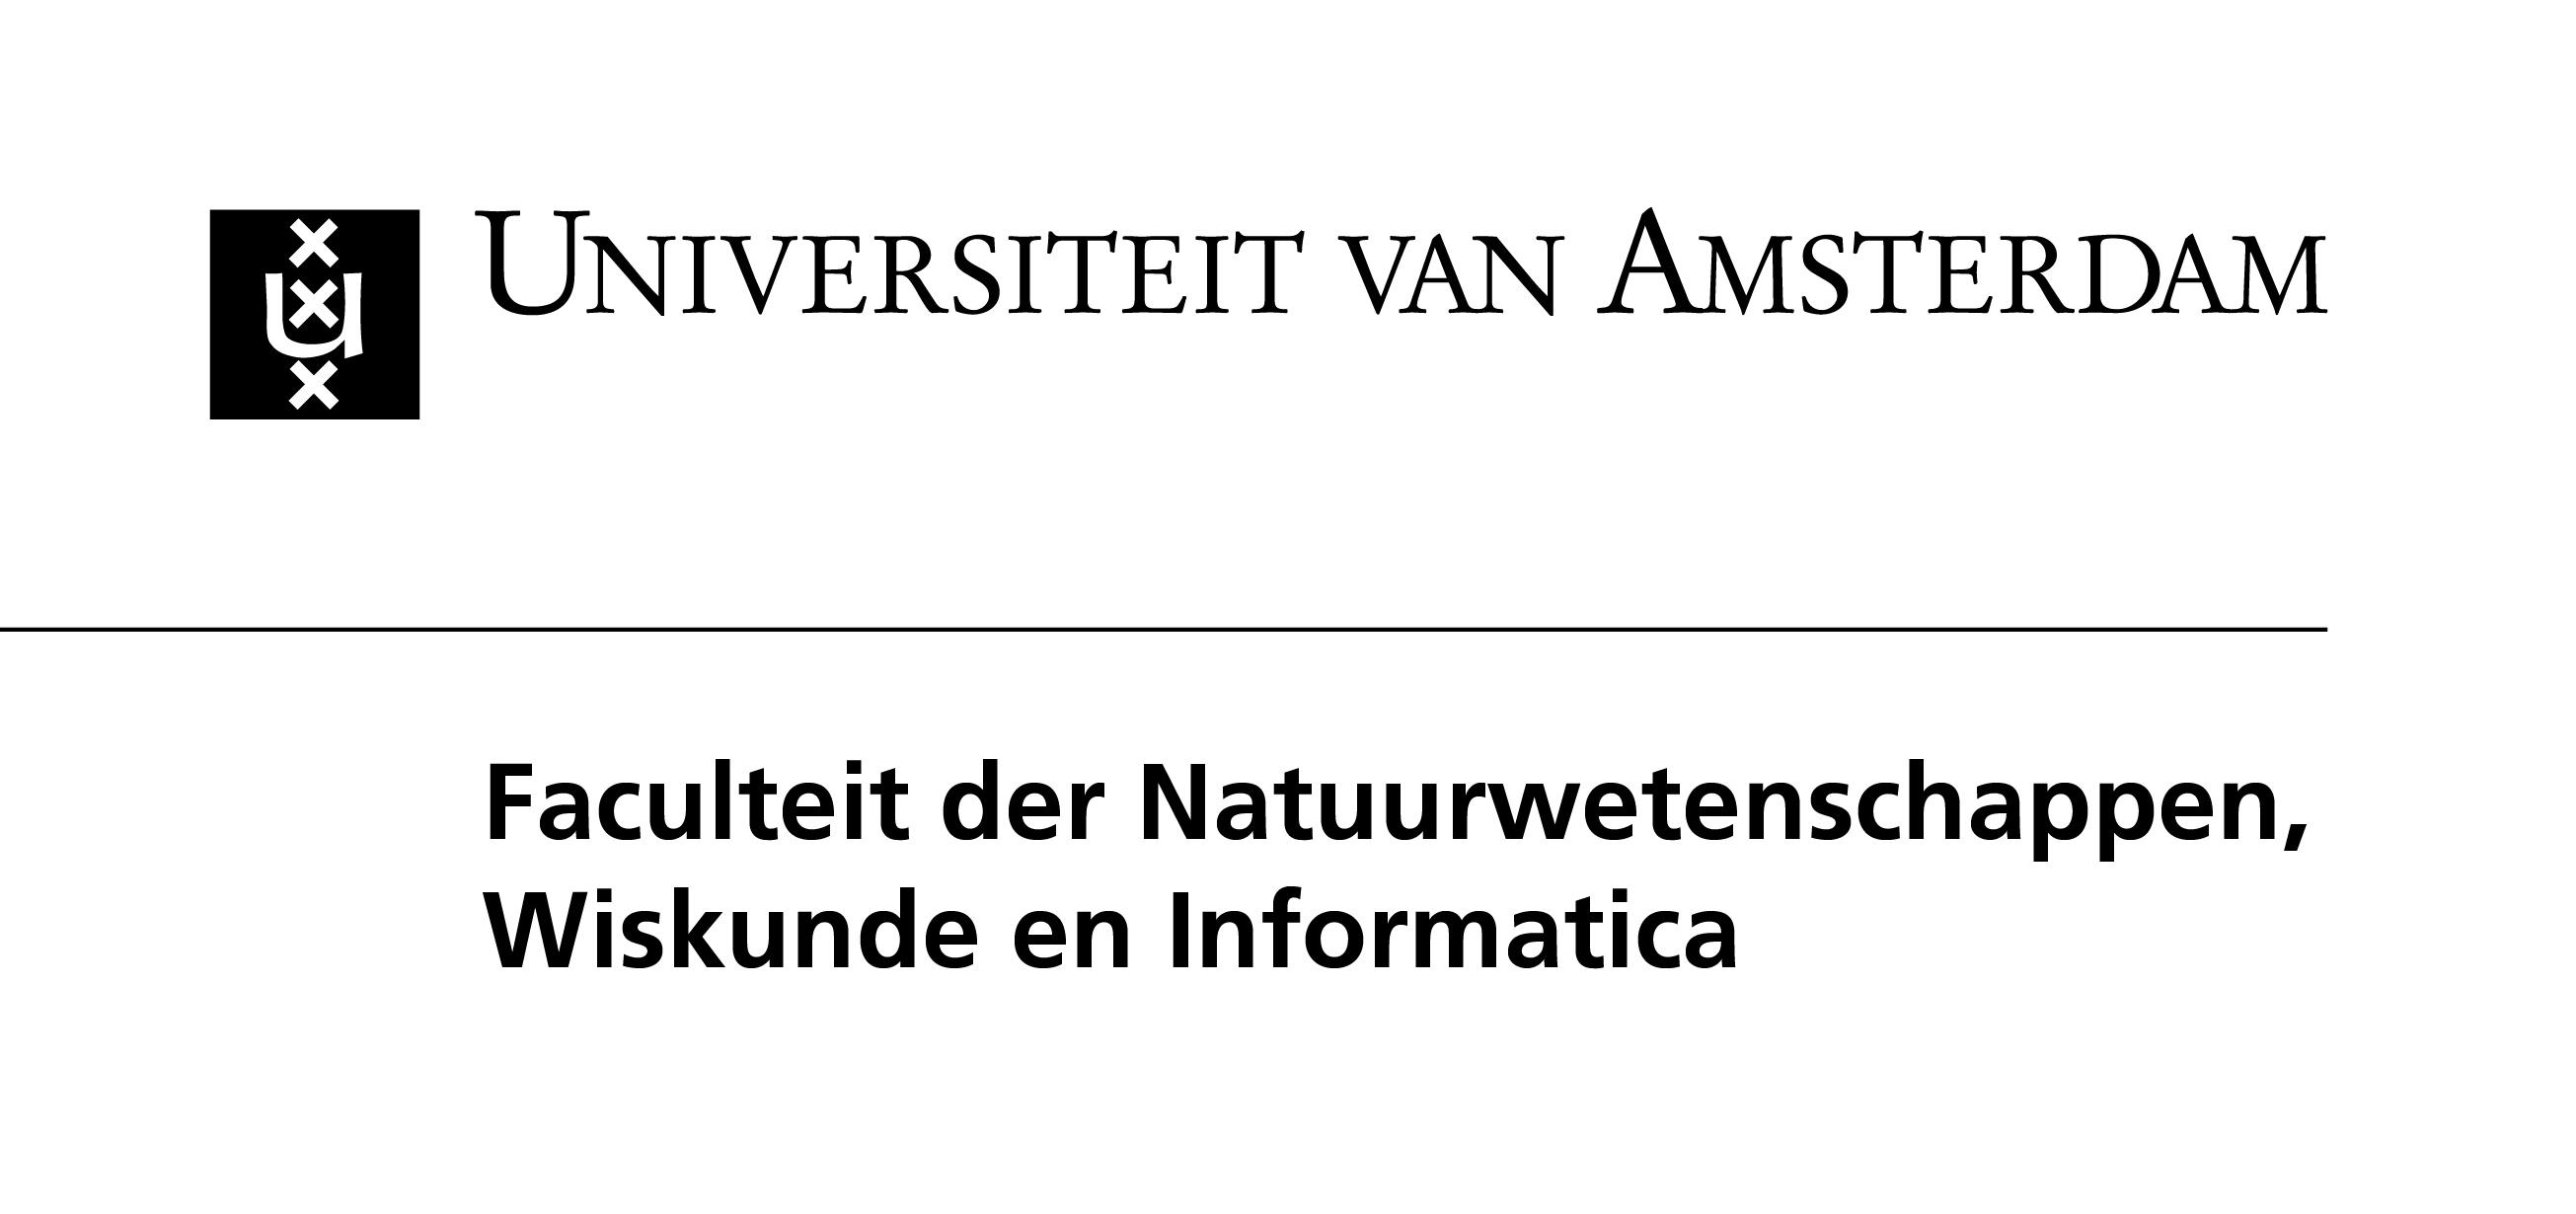 Swammerdam Institute for Life Sciences (SILS)